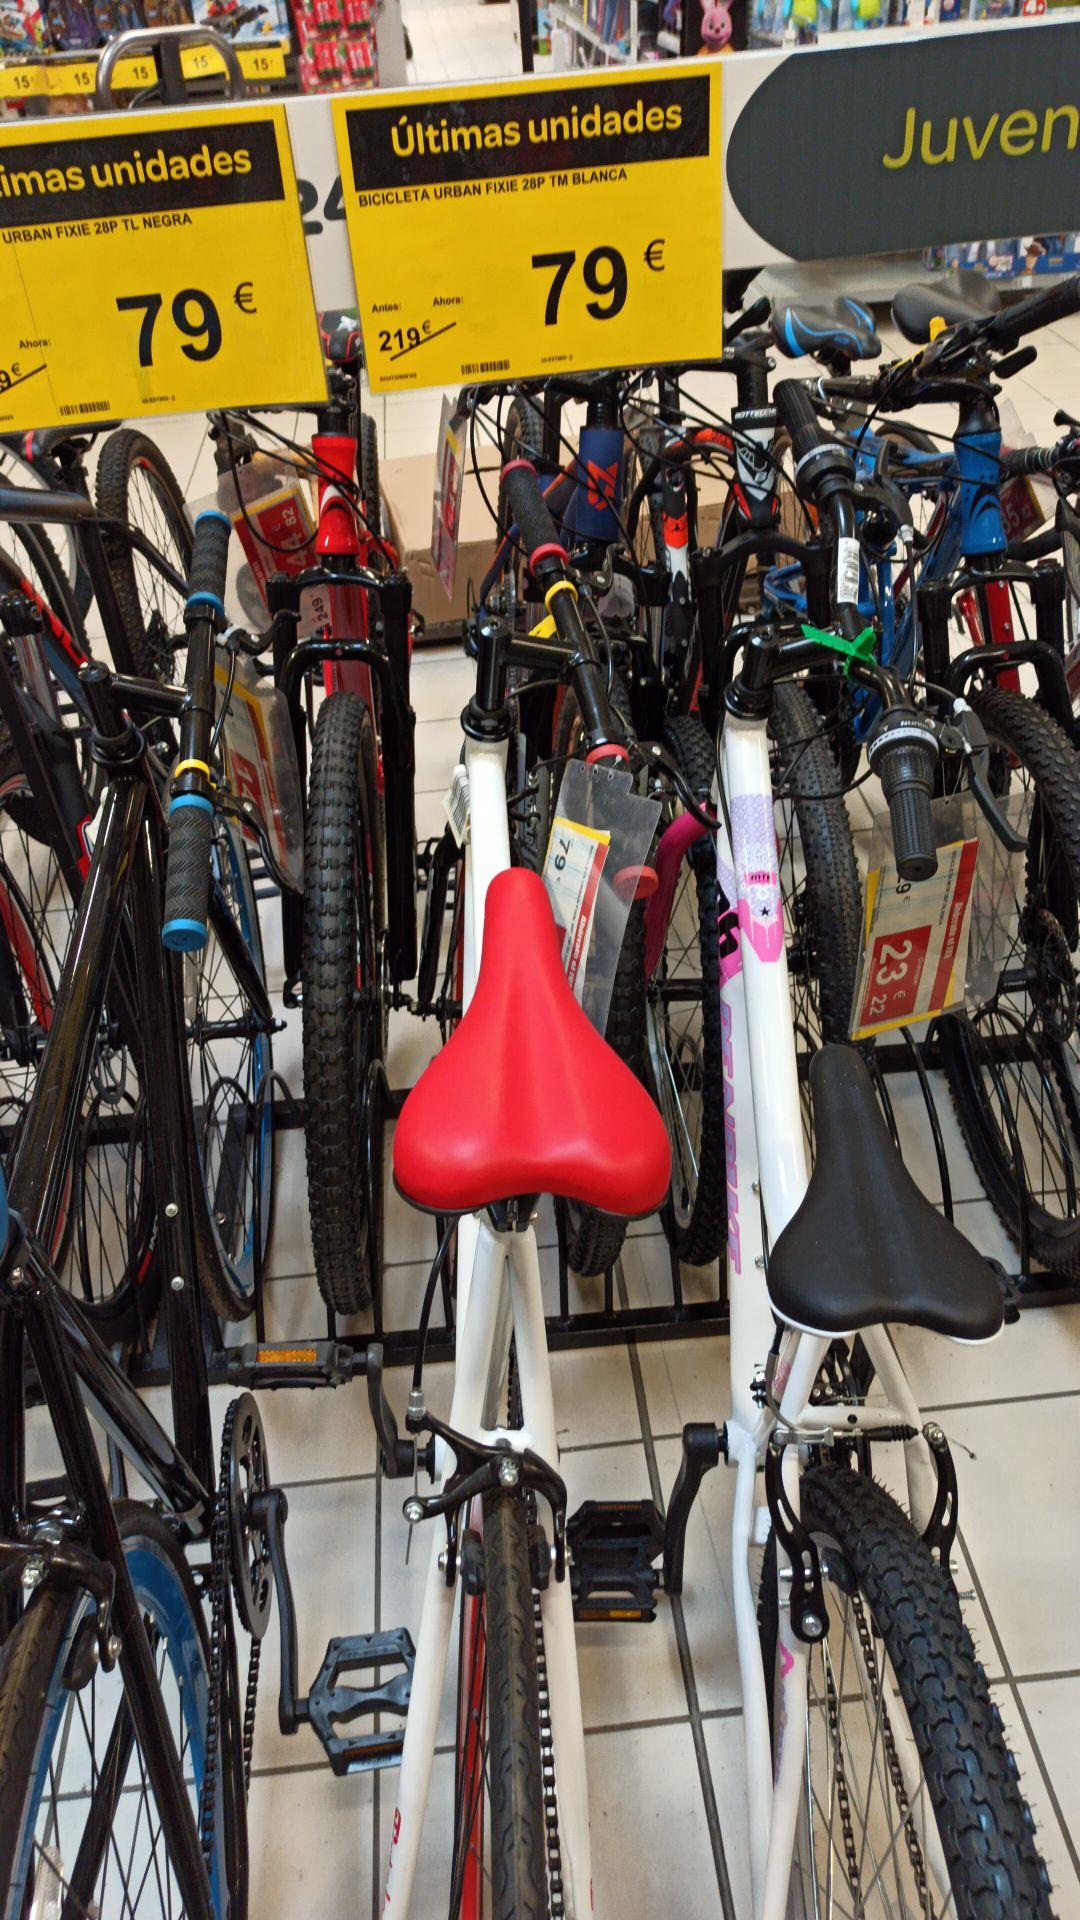 Bici fixie en liquidación (Carrefour Andujar)